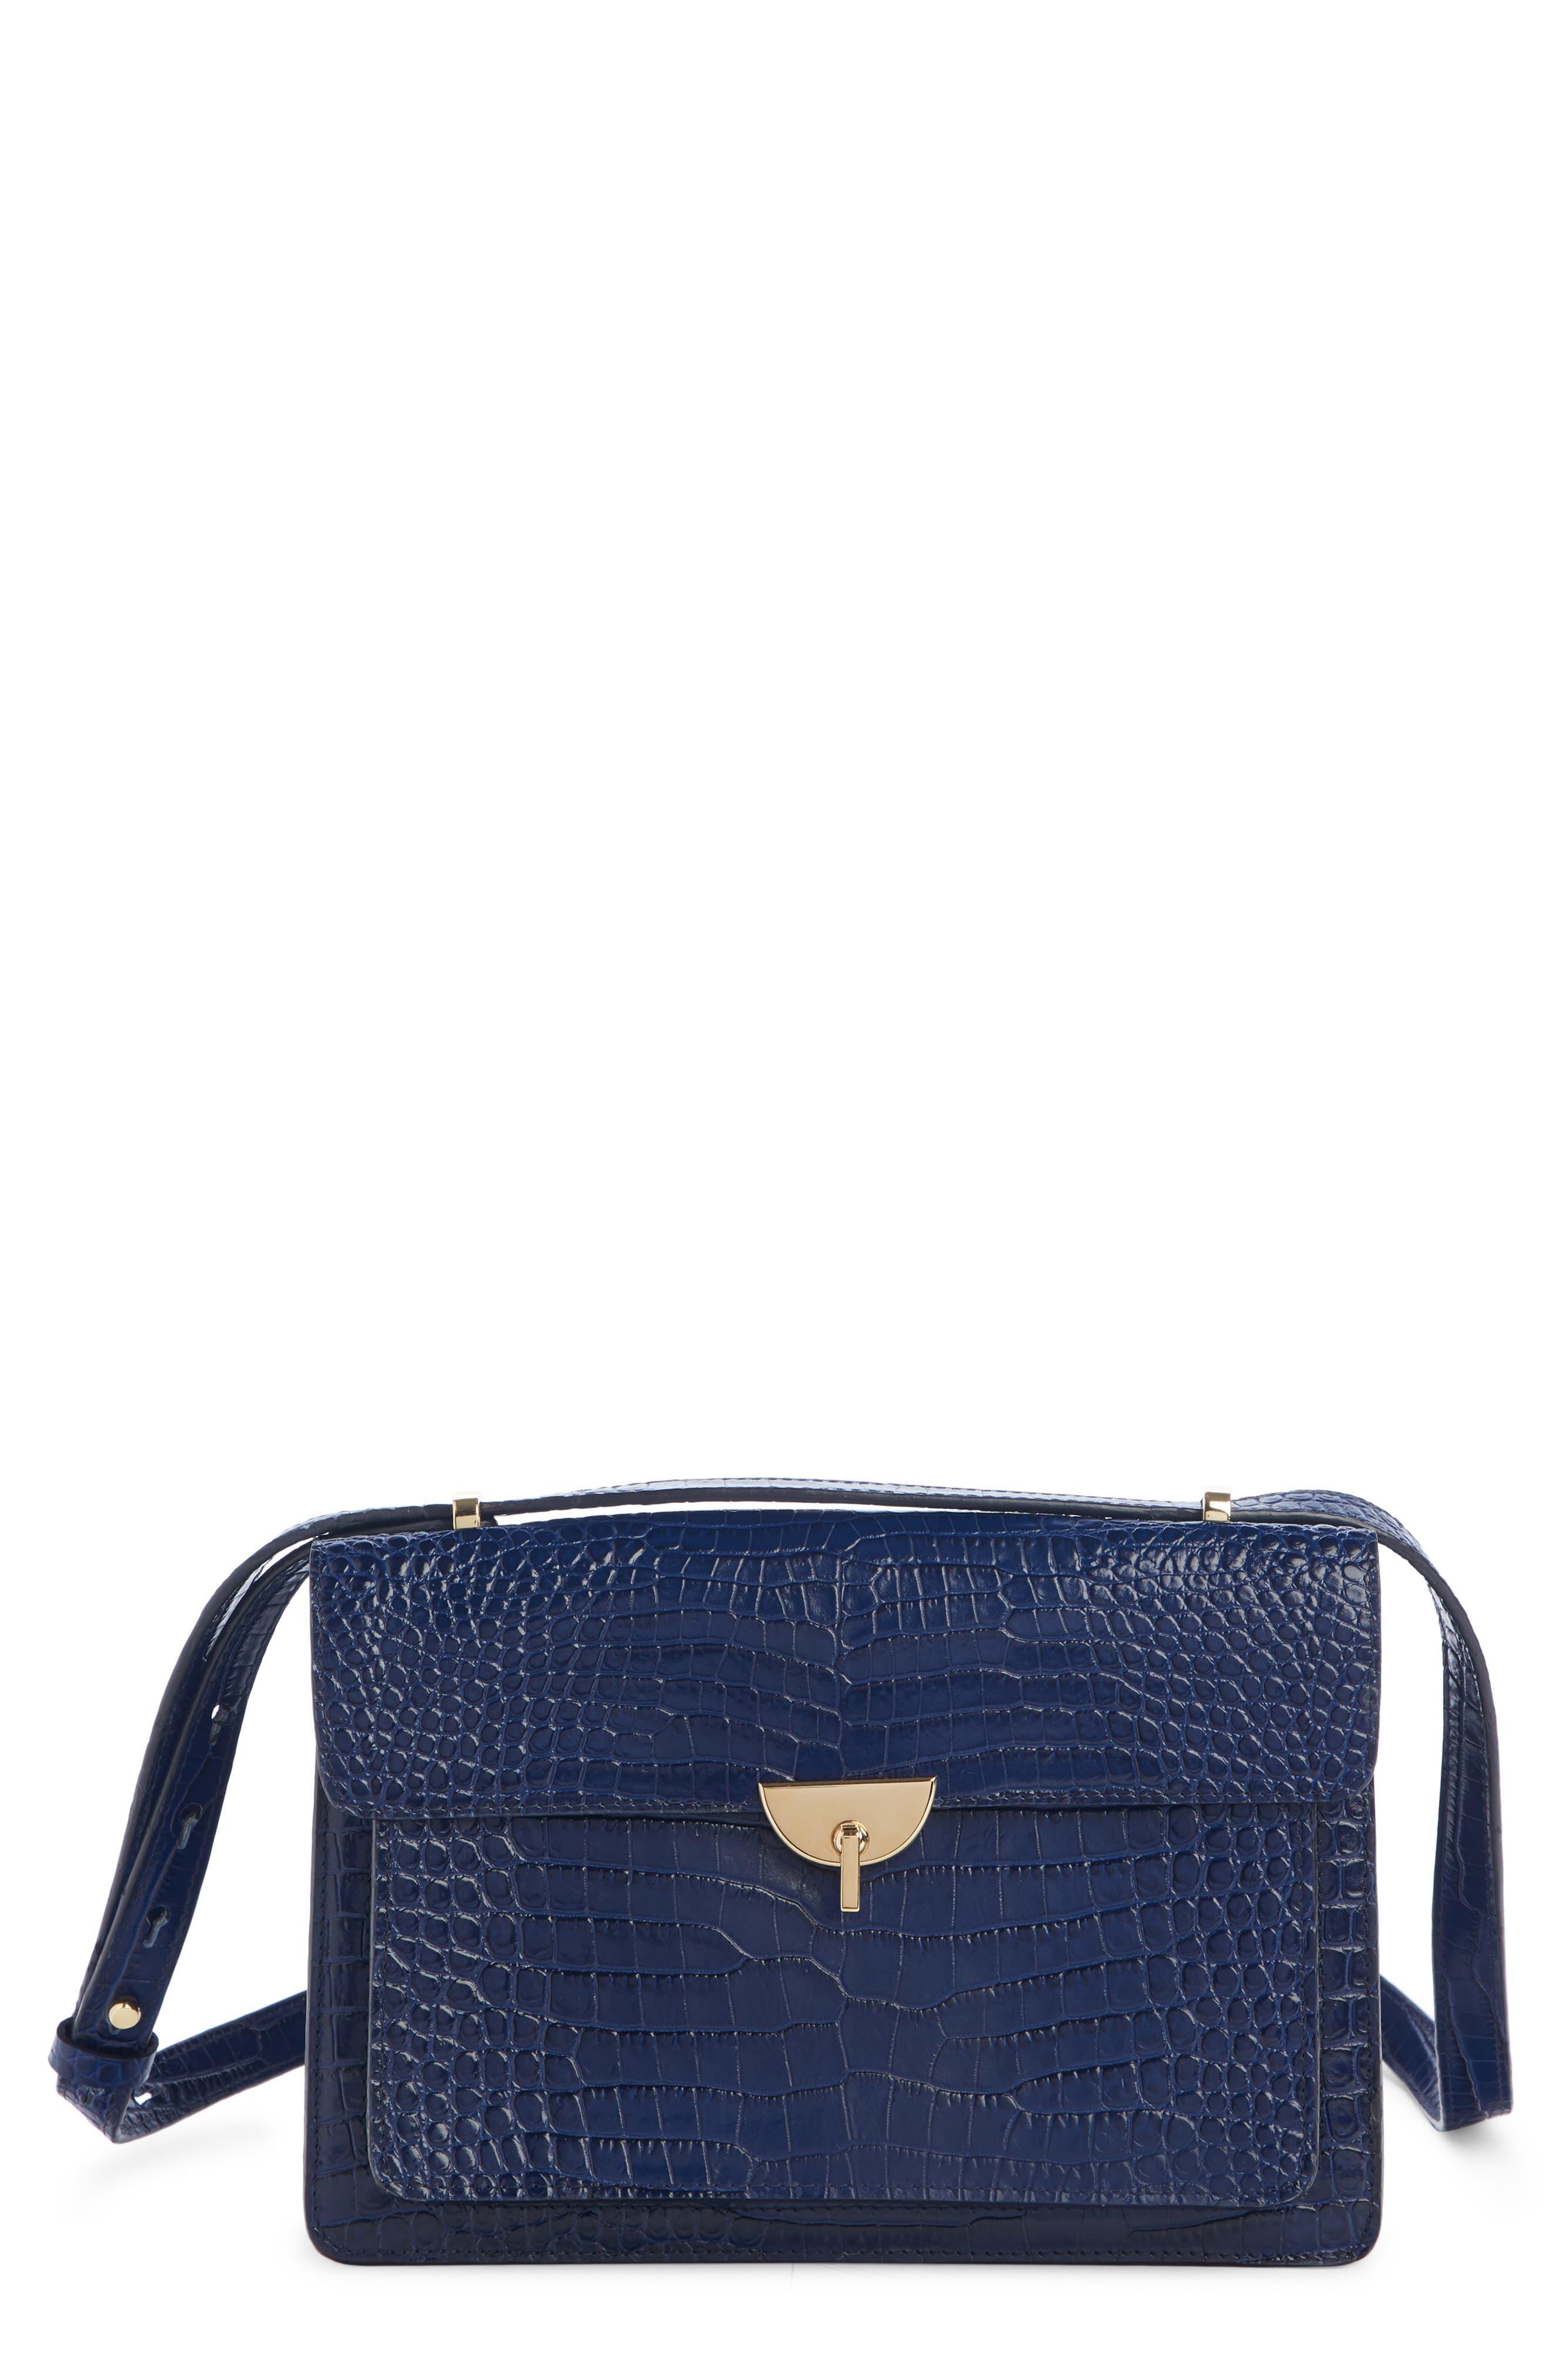 DRIES VAN NOTEN, Croc Embossed Leather Crossbody Bag, Main thumbnail 1, color, BLUE